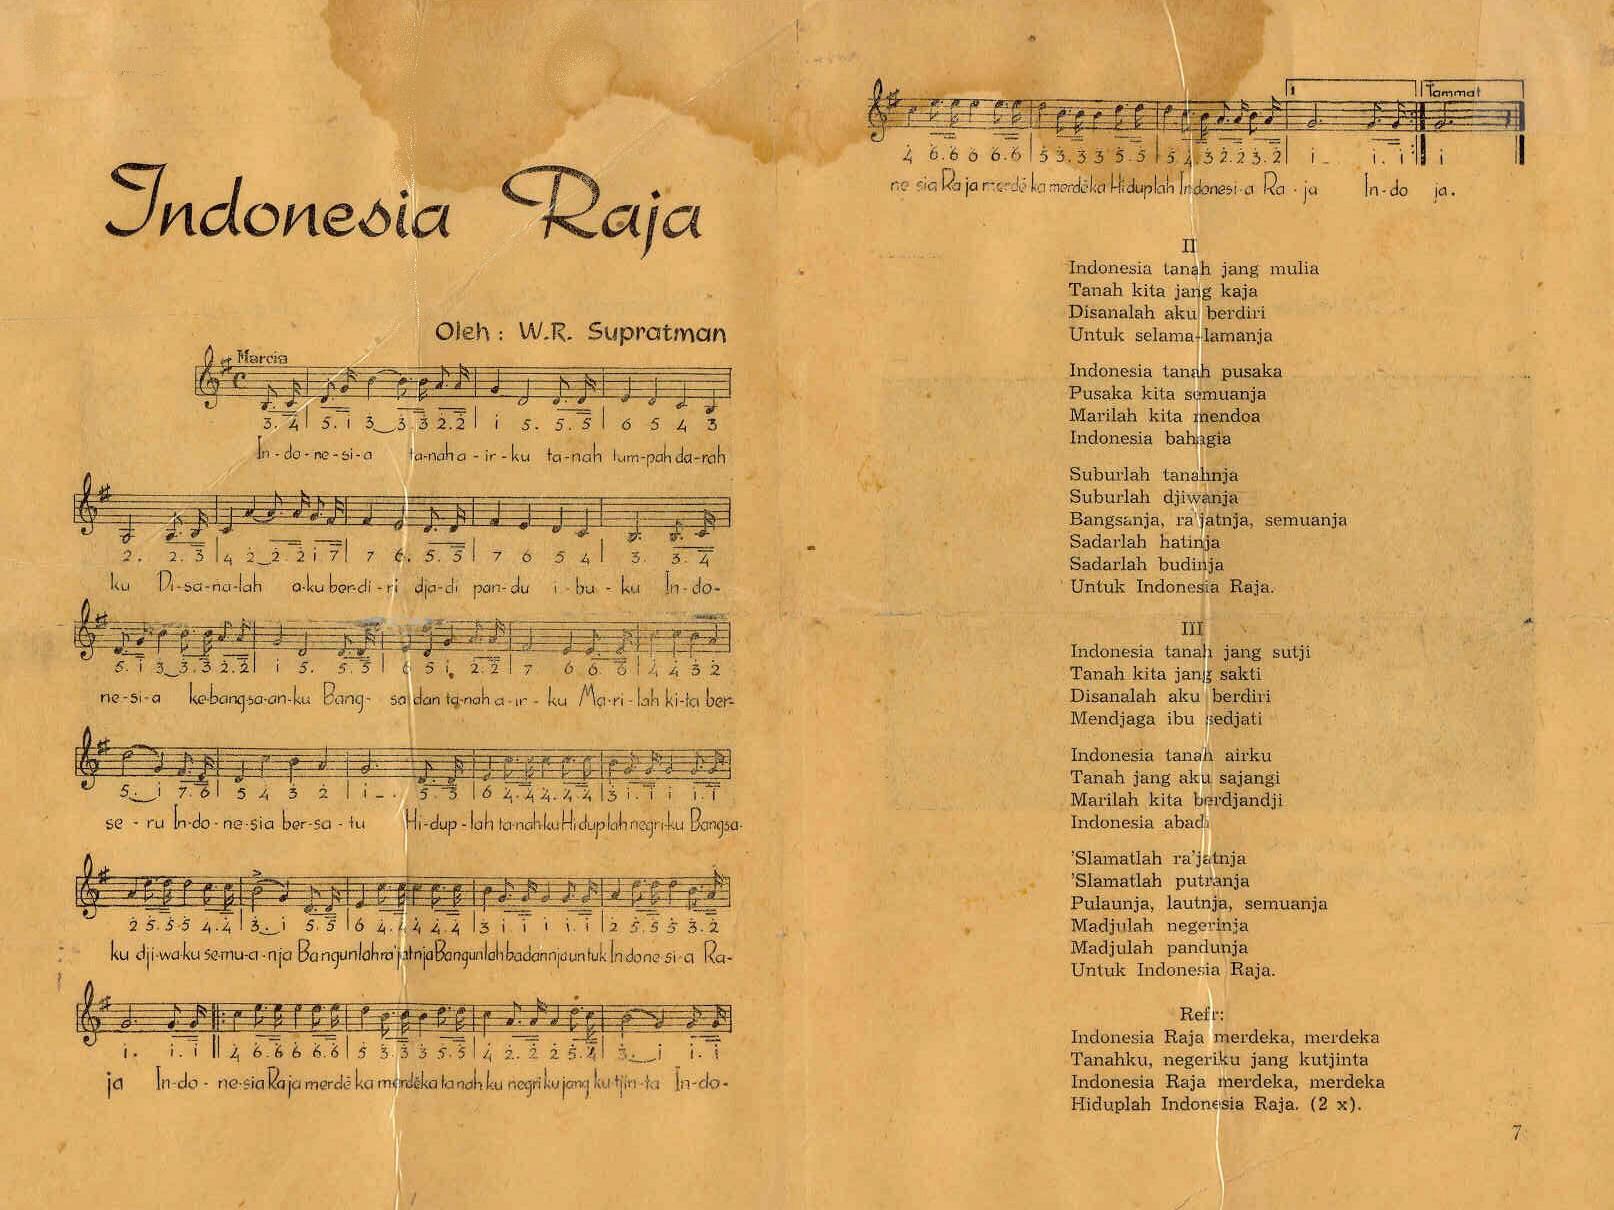 Galeri Indonesia » Lagu Indonesia Raya